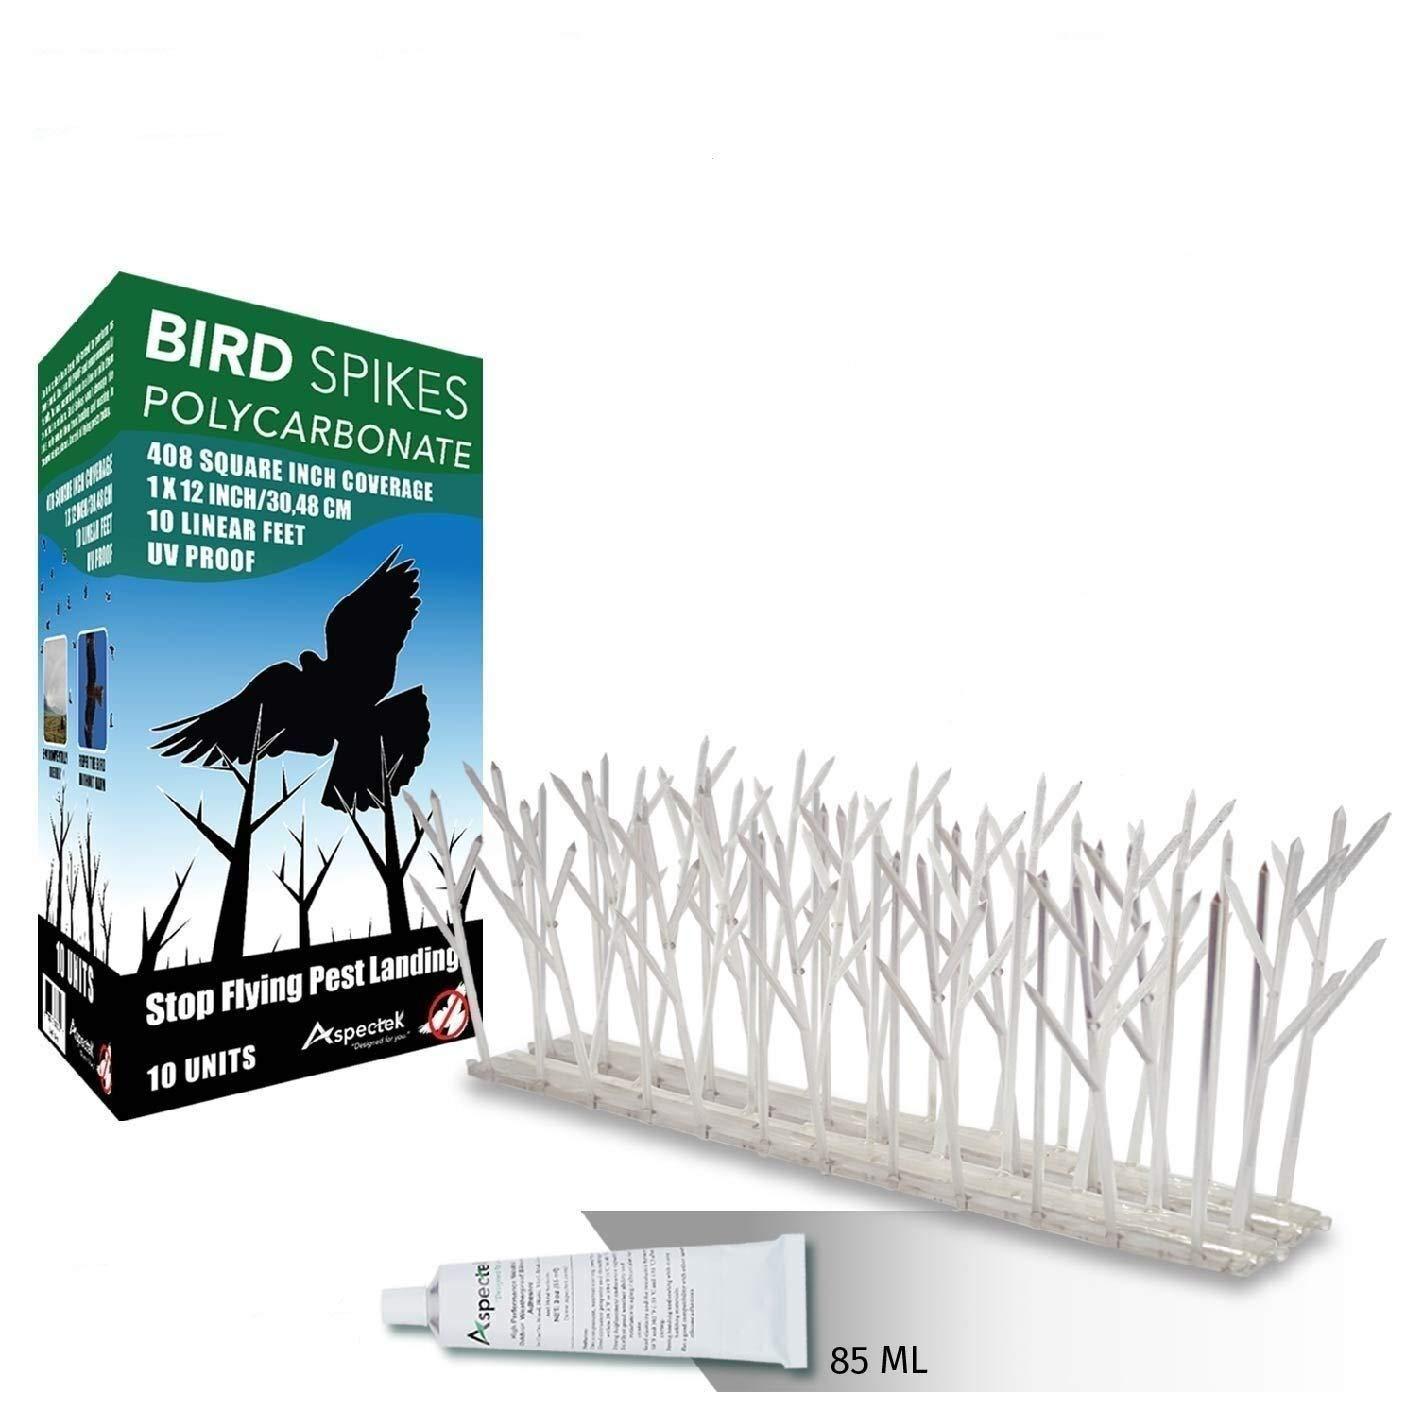 Aspectek Stainless Steel Bird Spikes Kit, 10 Feet (3 Metre). Perfect Bird Gel Deterrent (Without Glue) Others